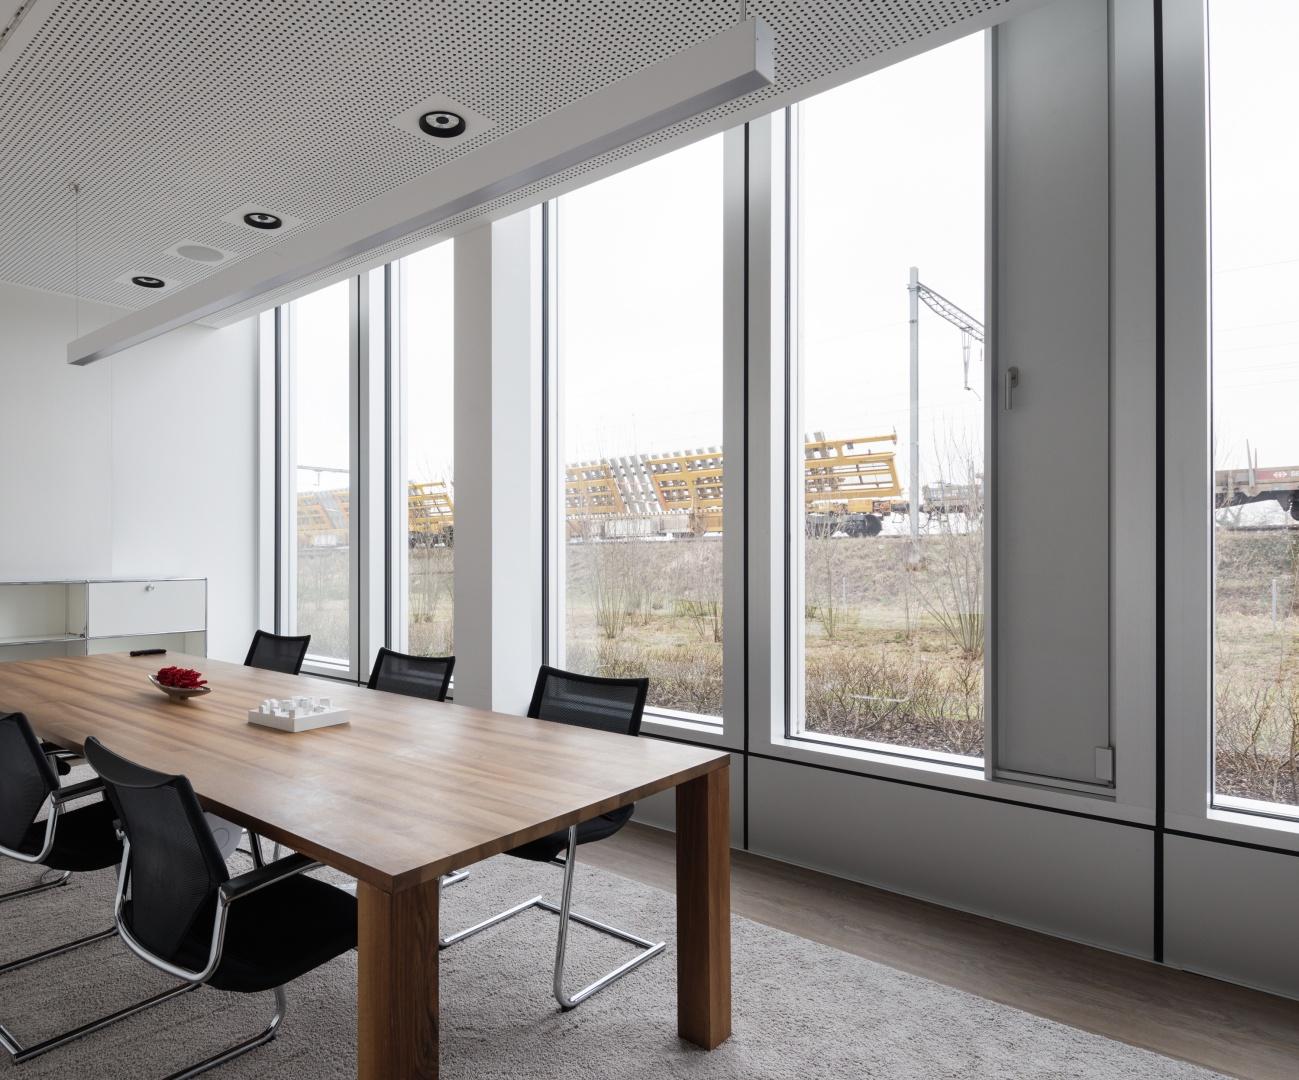 Büro © Ulrich Stockhaus, Zürich